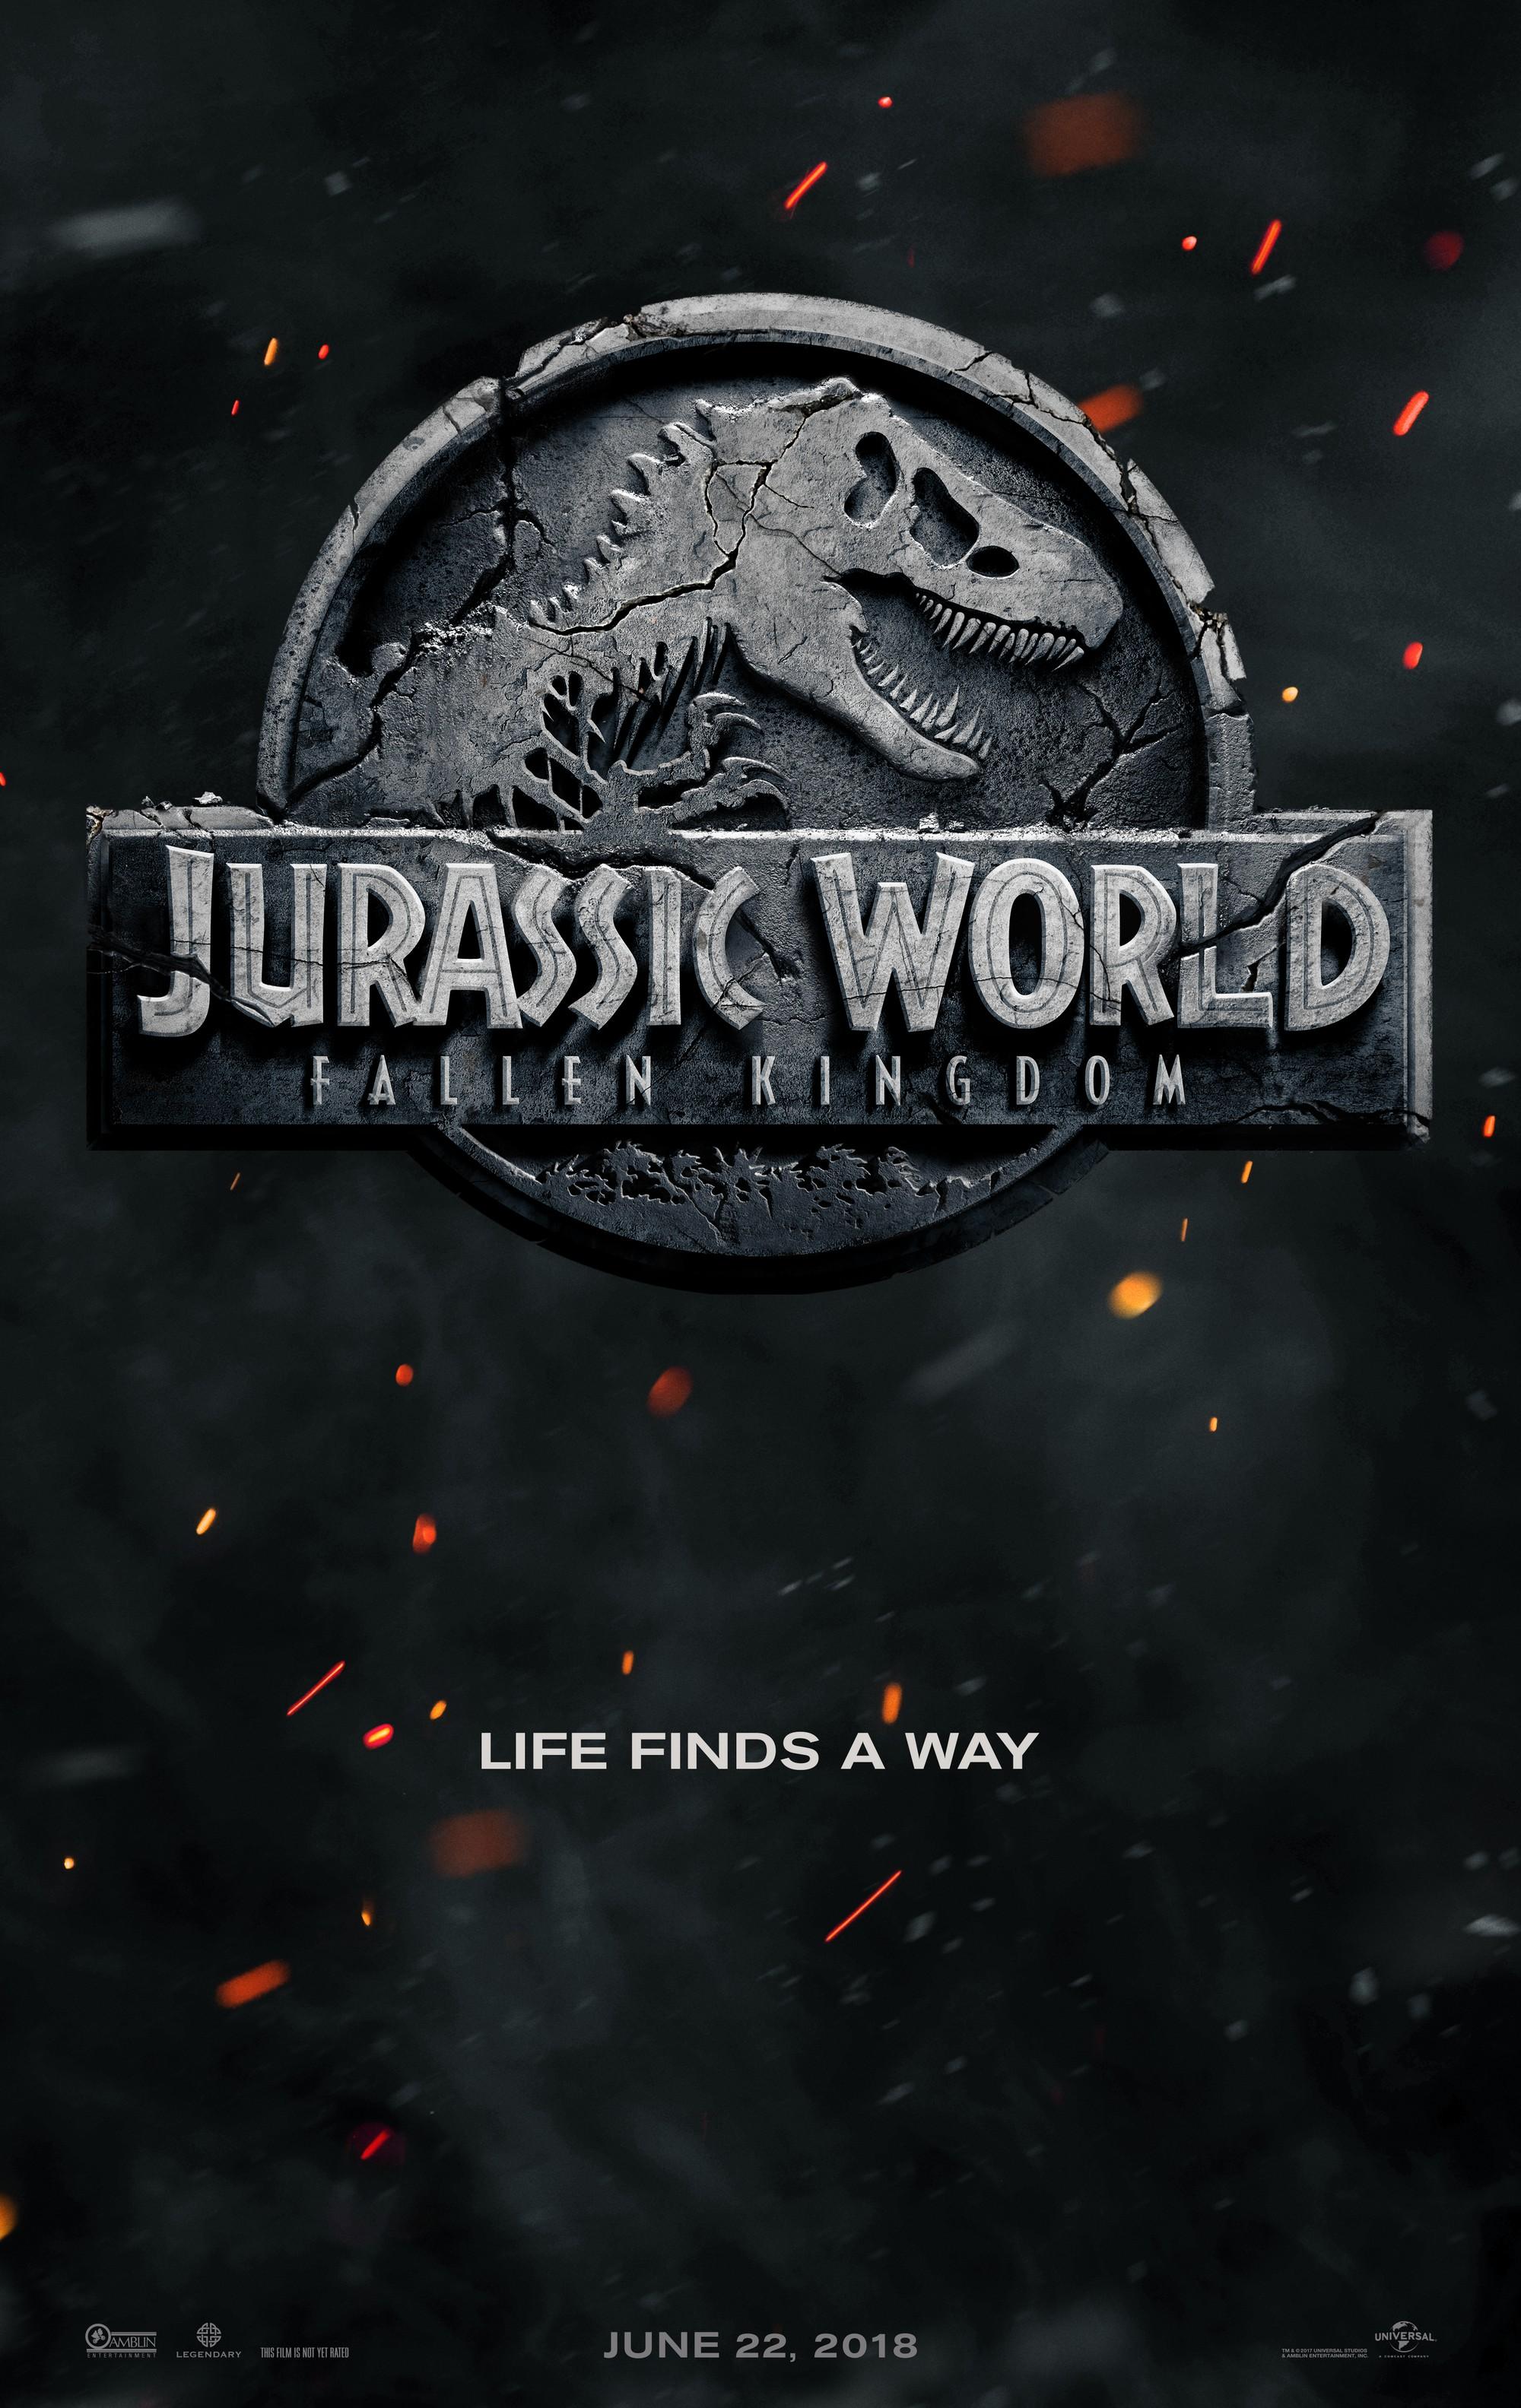 jurassic-world-2-poster-1512609106748.jp